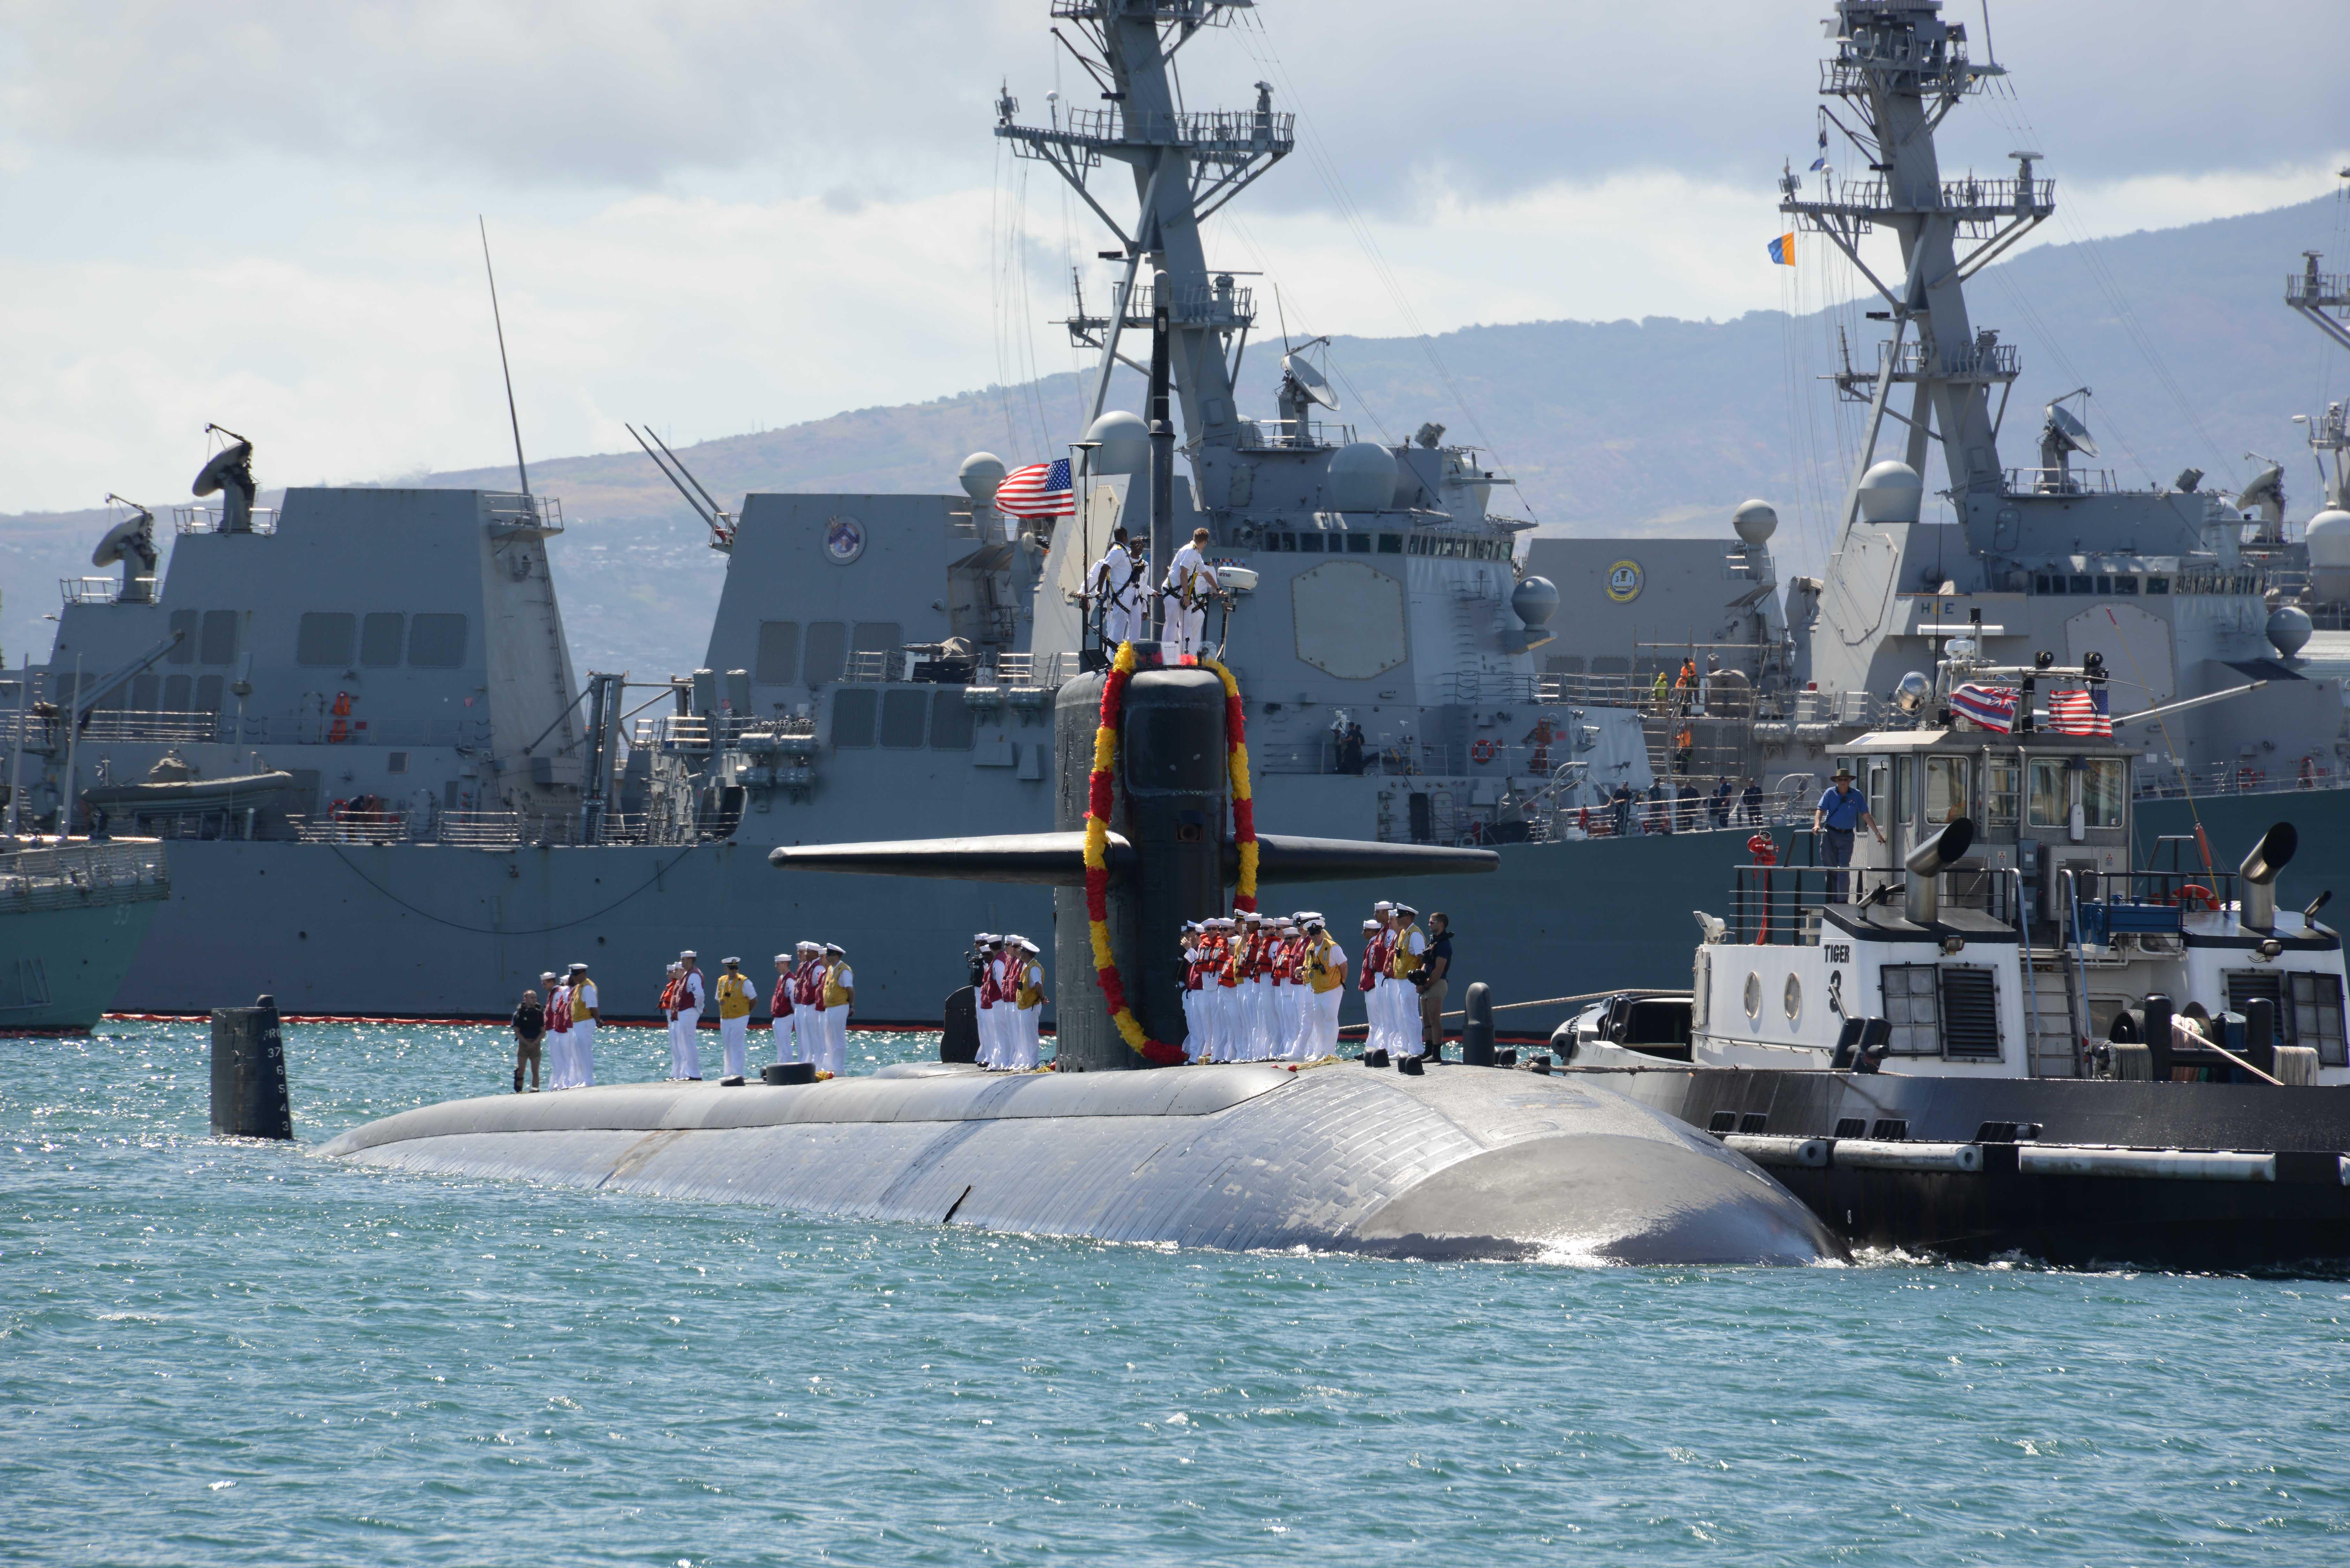 USS LA JOLLA SSN-701 Einlaufen Pearl Harbor am 03.09.2014 Bild: U.S. Navy